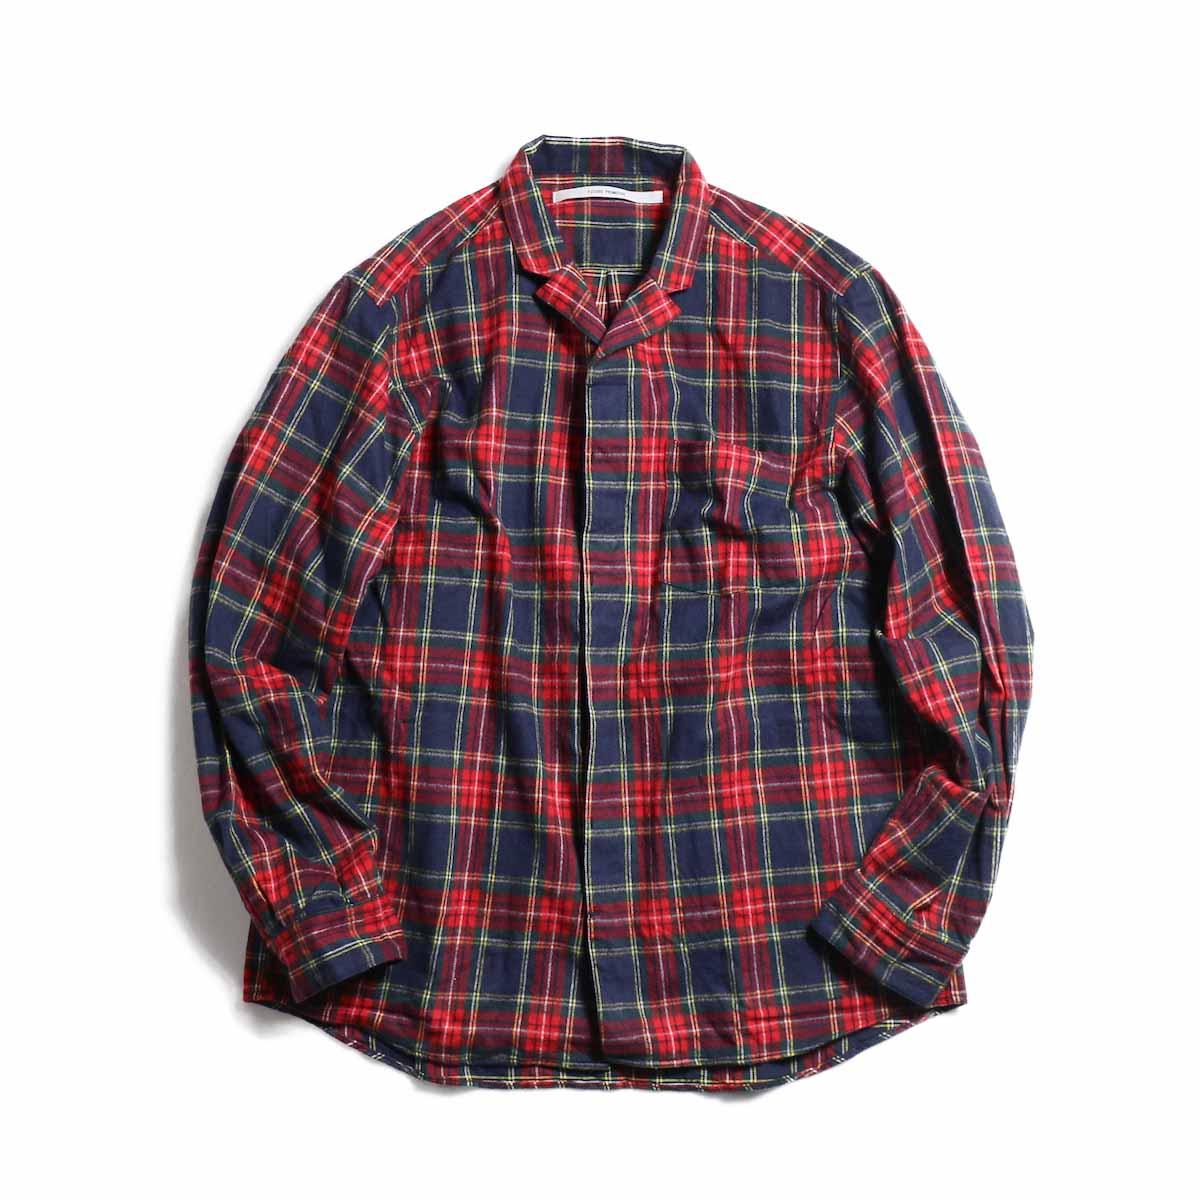 FUTURE PRIMITIVE / FP Notched Shirt(Tartan) -Navy 正面